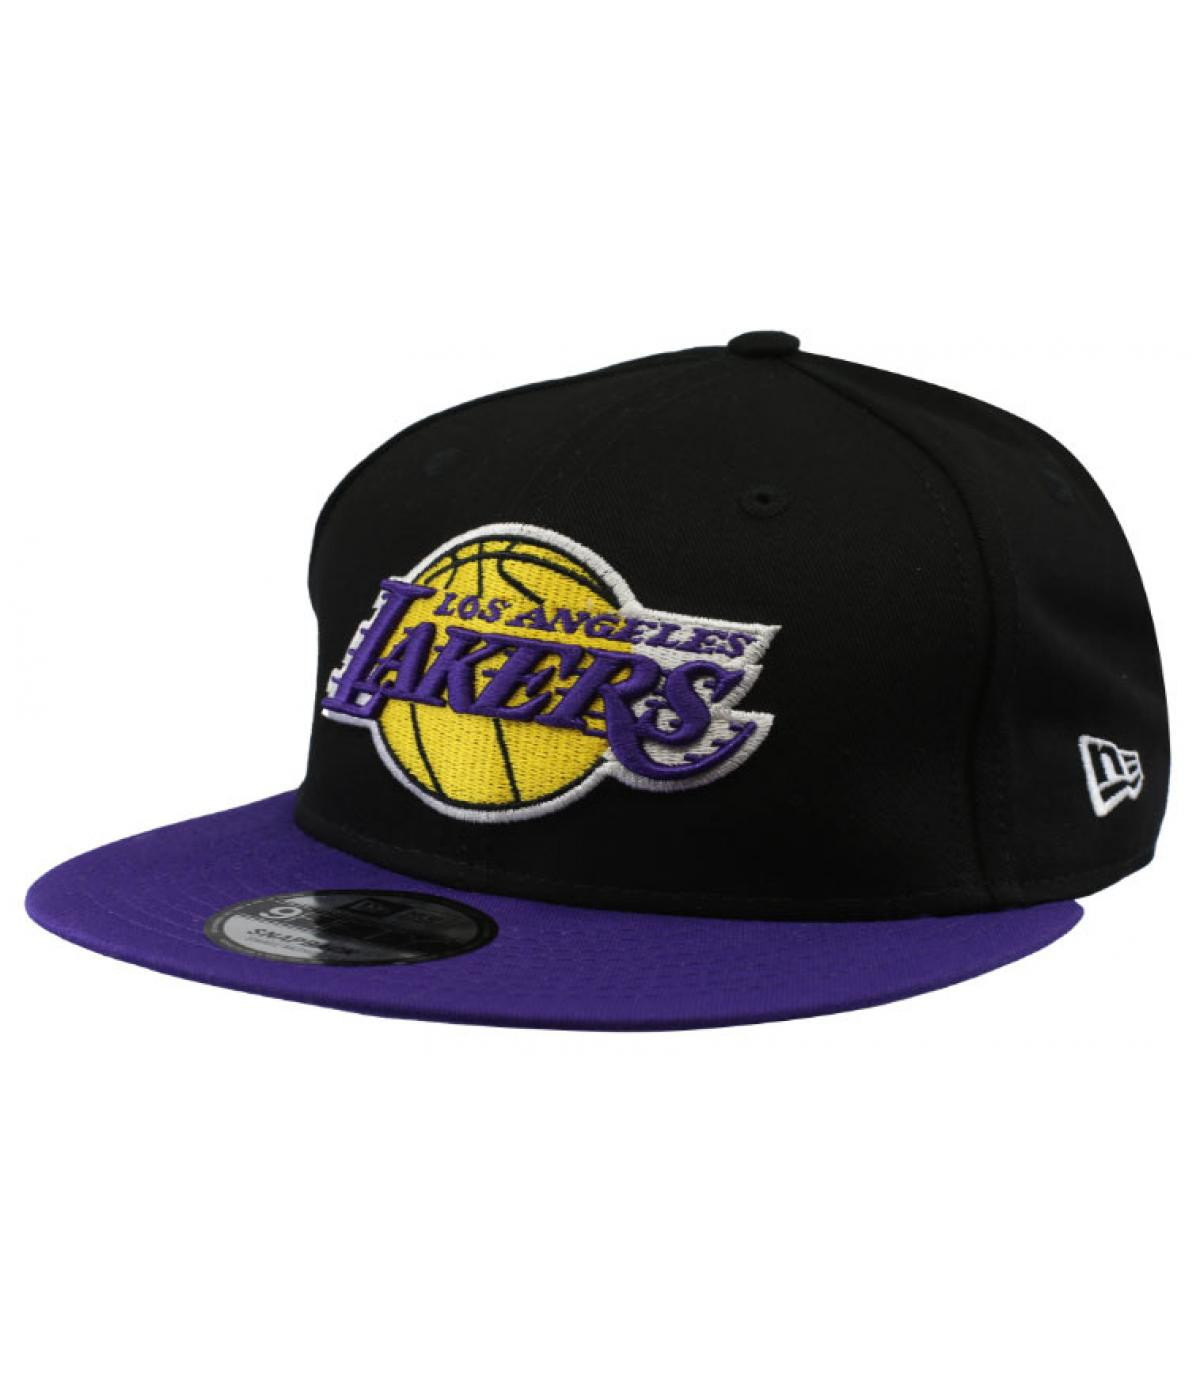 snapback noir violet Lakers